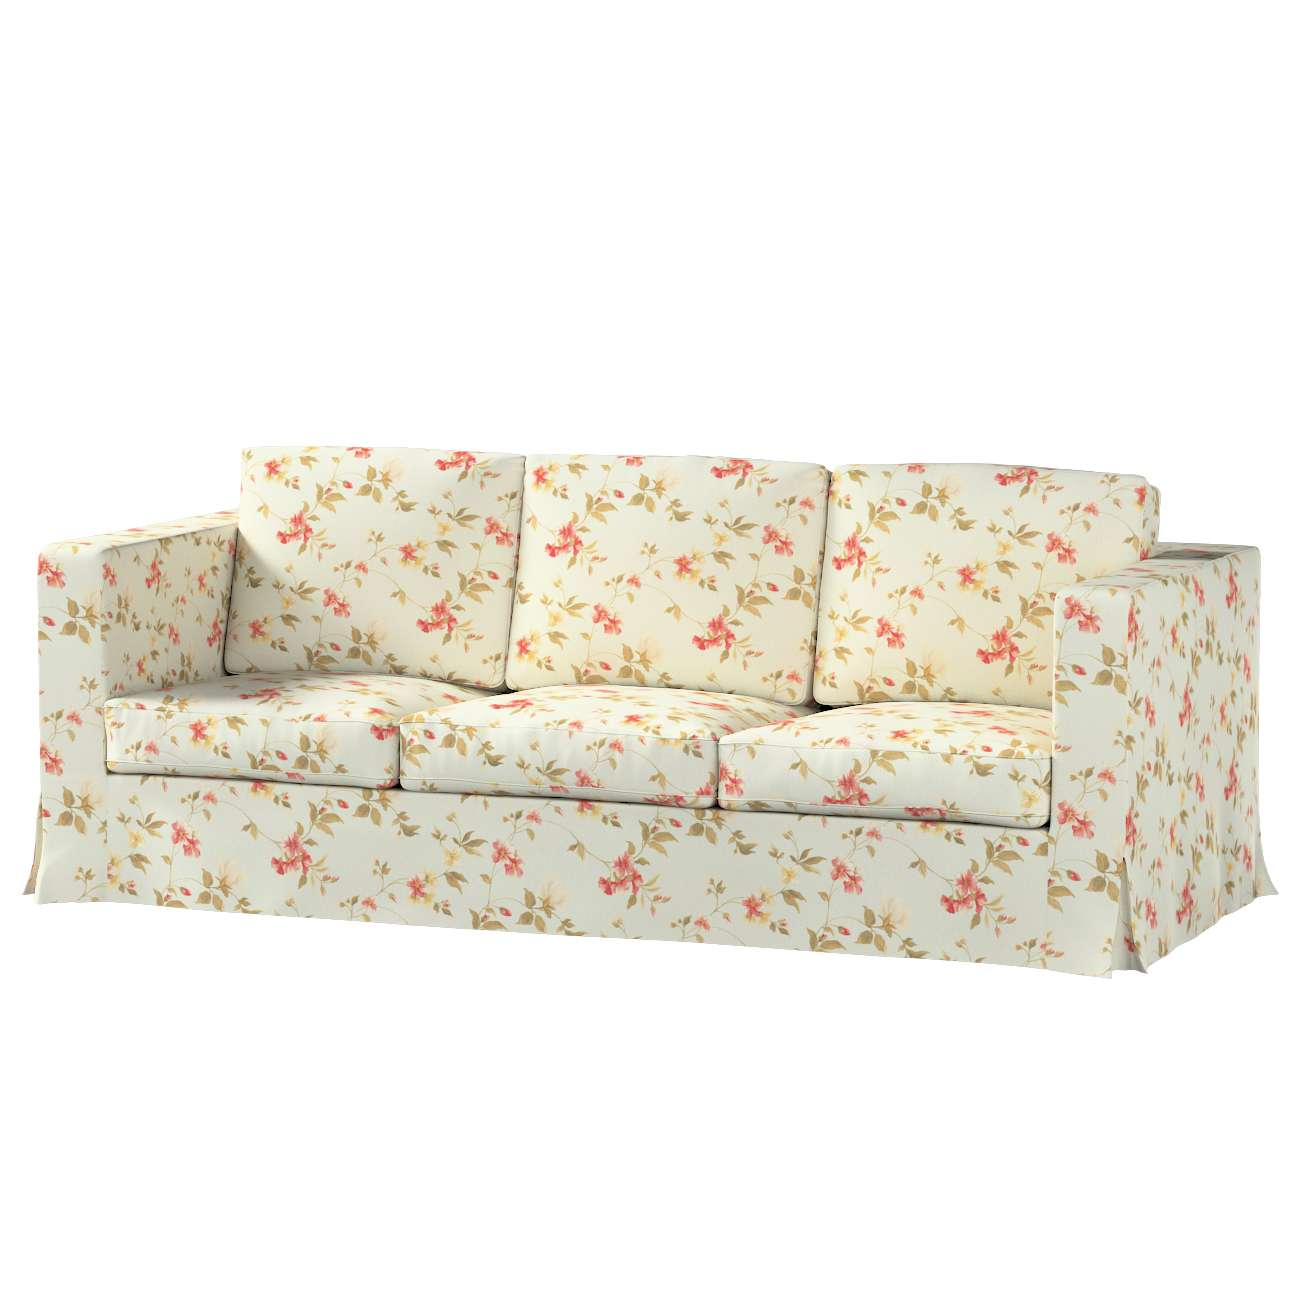 Karlanda 3-Sitzer  Sofabezug nicht ausklappbar lang Sofa Karlanda 3-lang von der Kollektion Londres, Stoff: 124-65